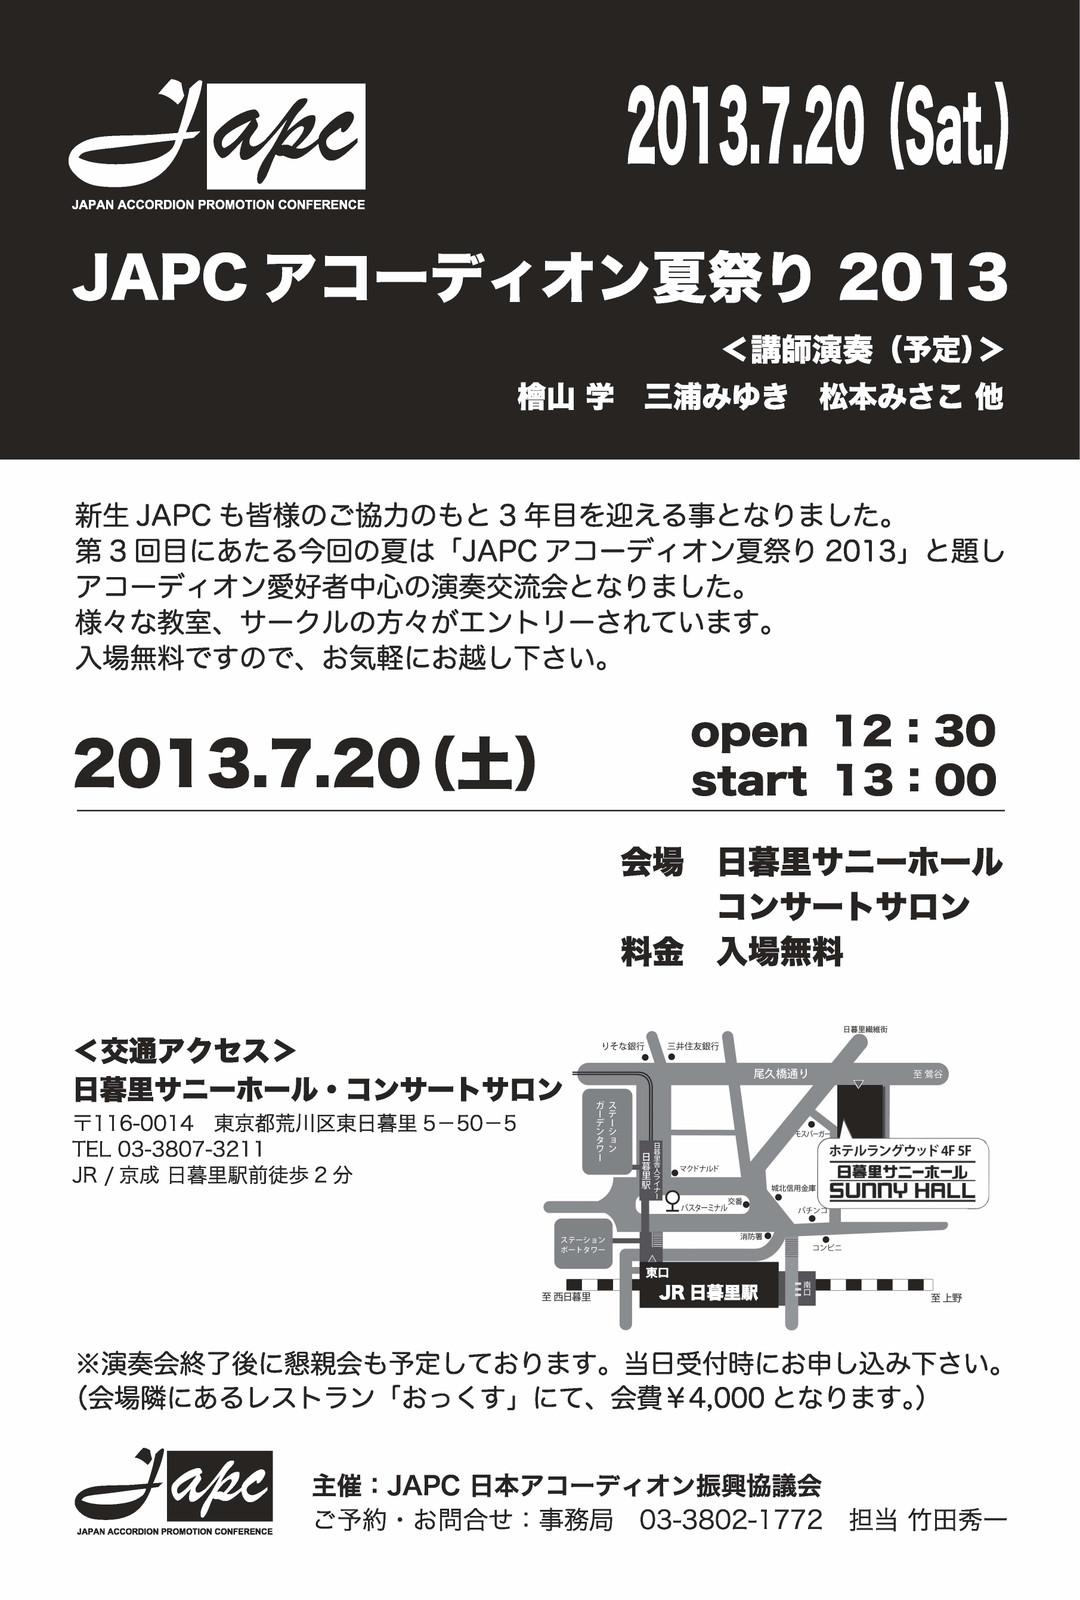 Japc_2013_3